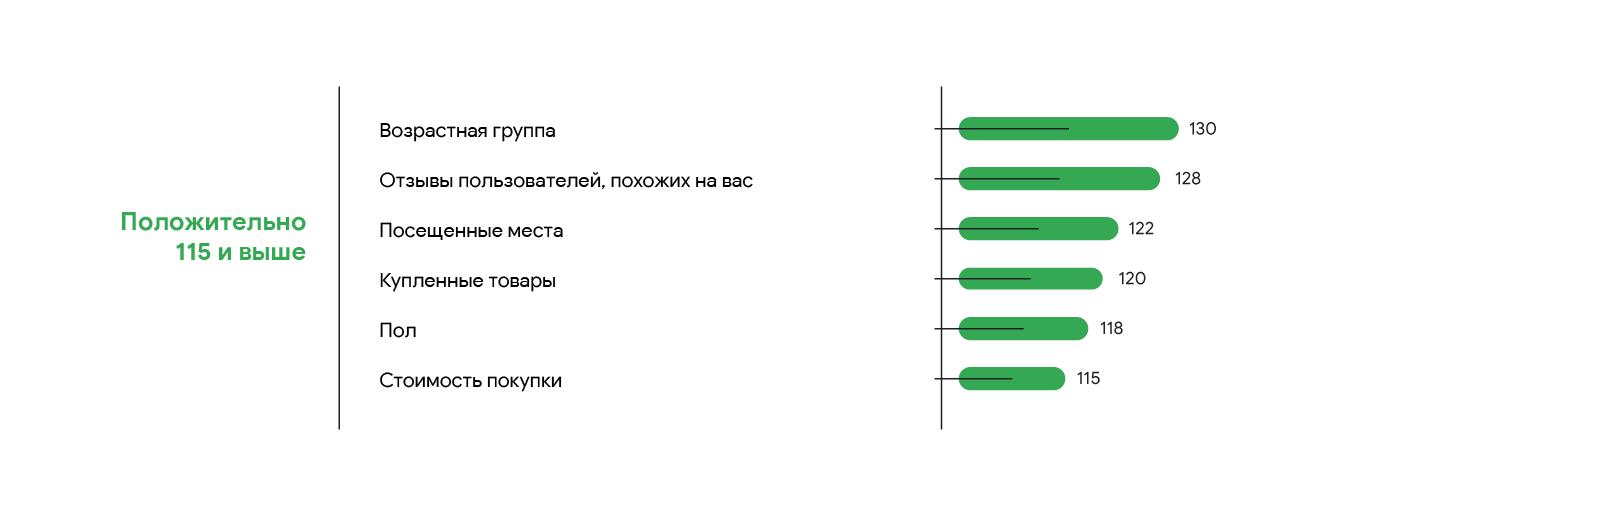 Acceptance-of-general-information-RU